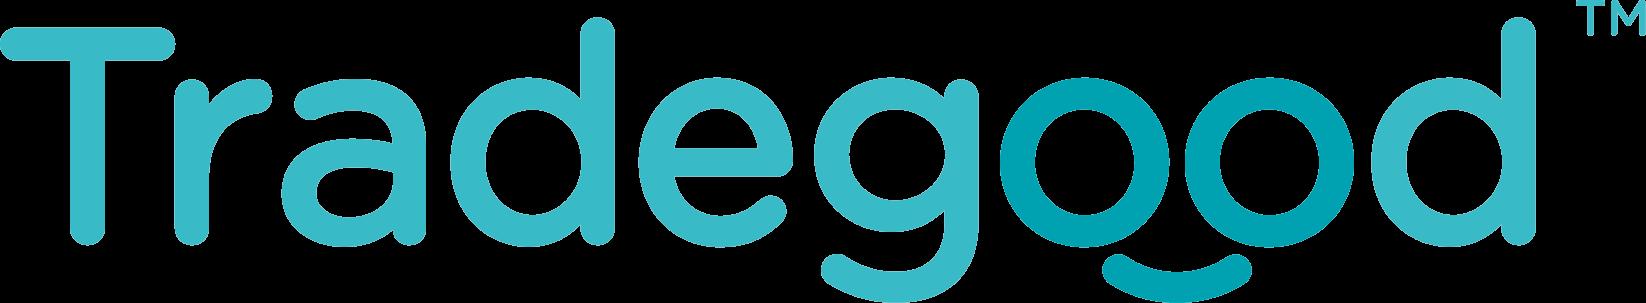 tradegood-logo